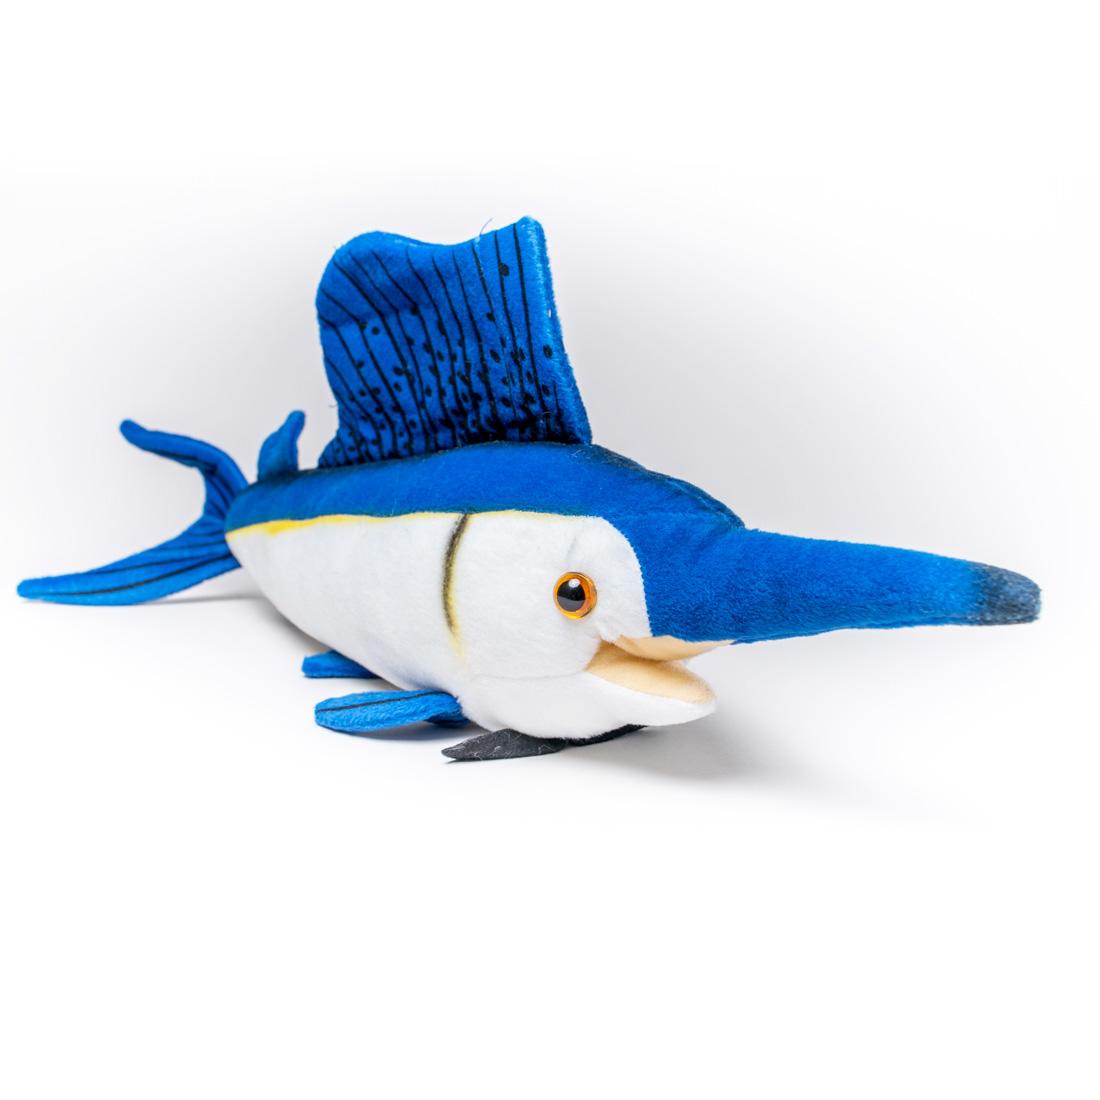 Cabin Critters – Sailfish | バショウカジキ